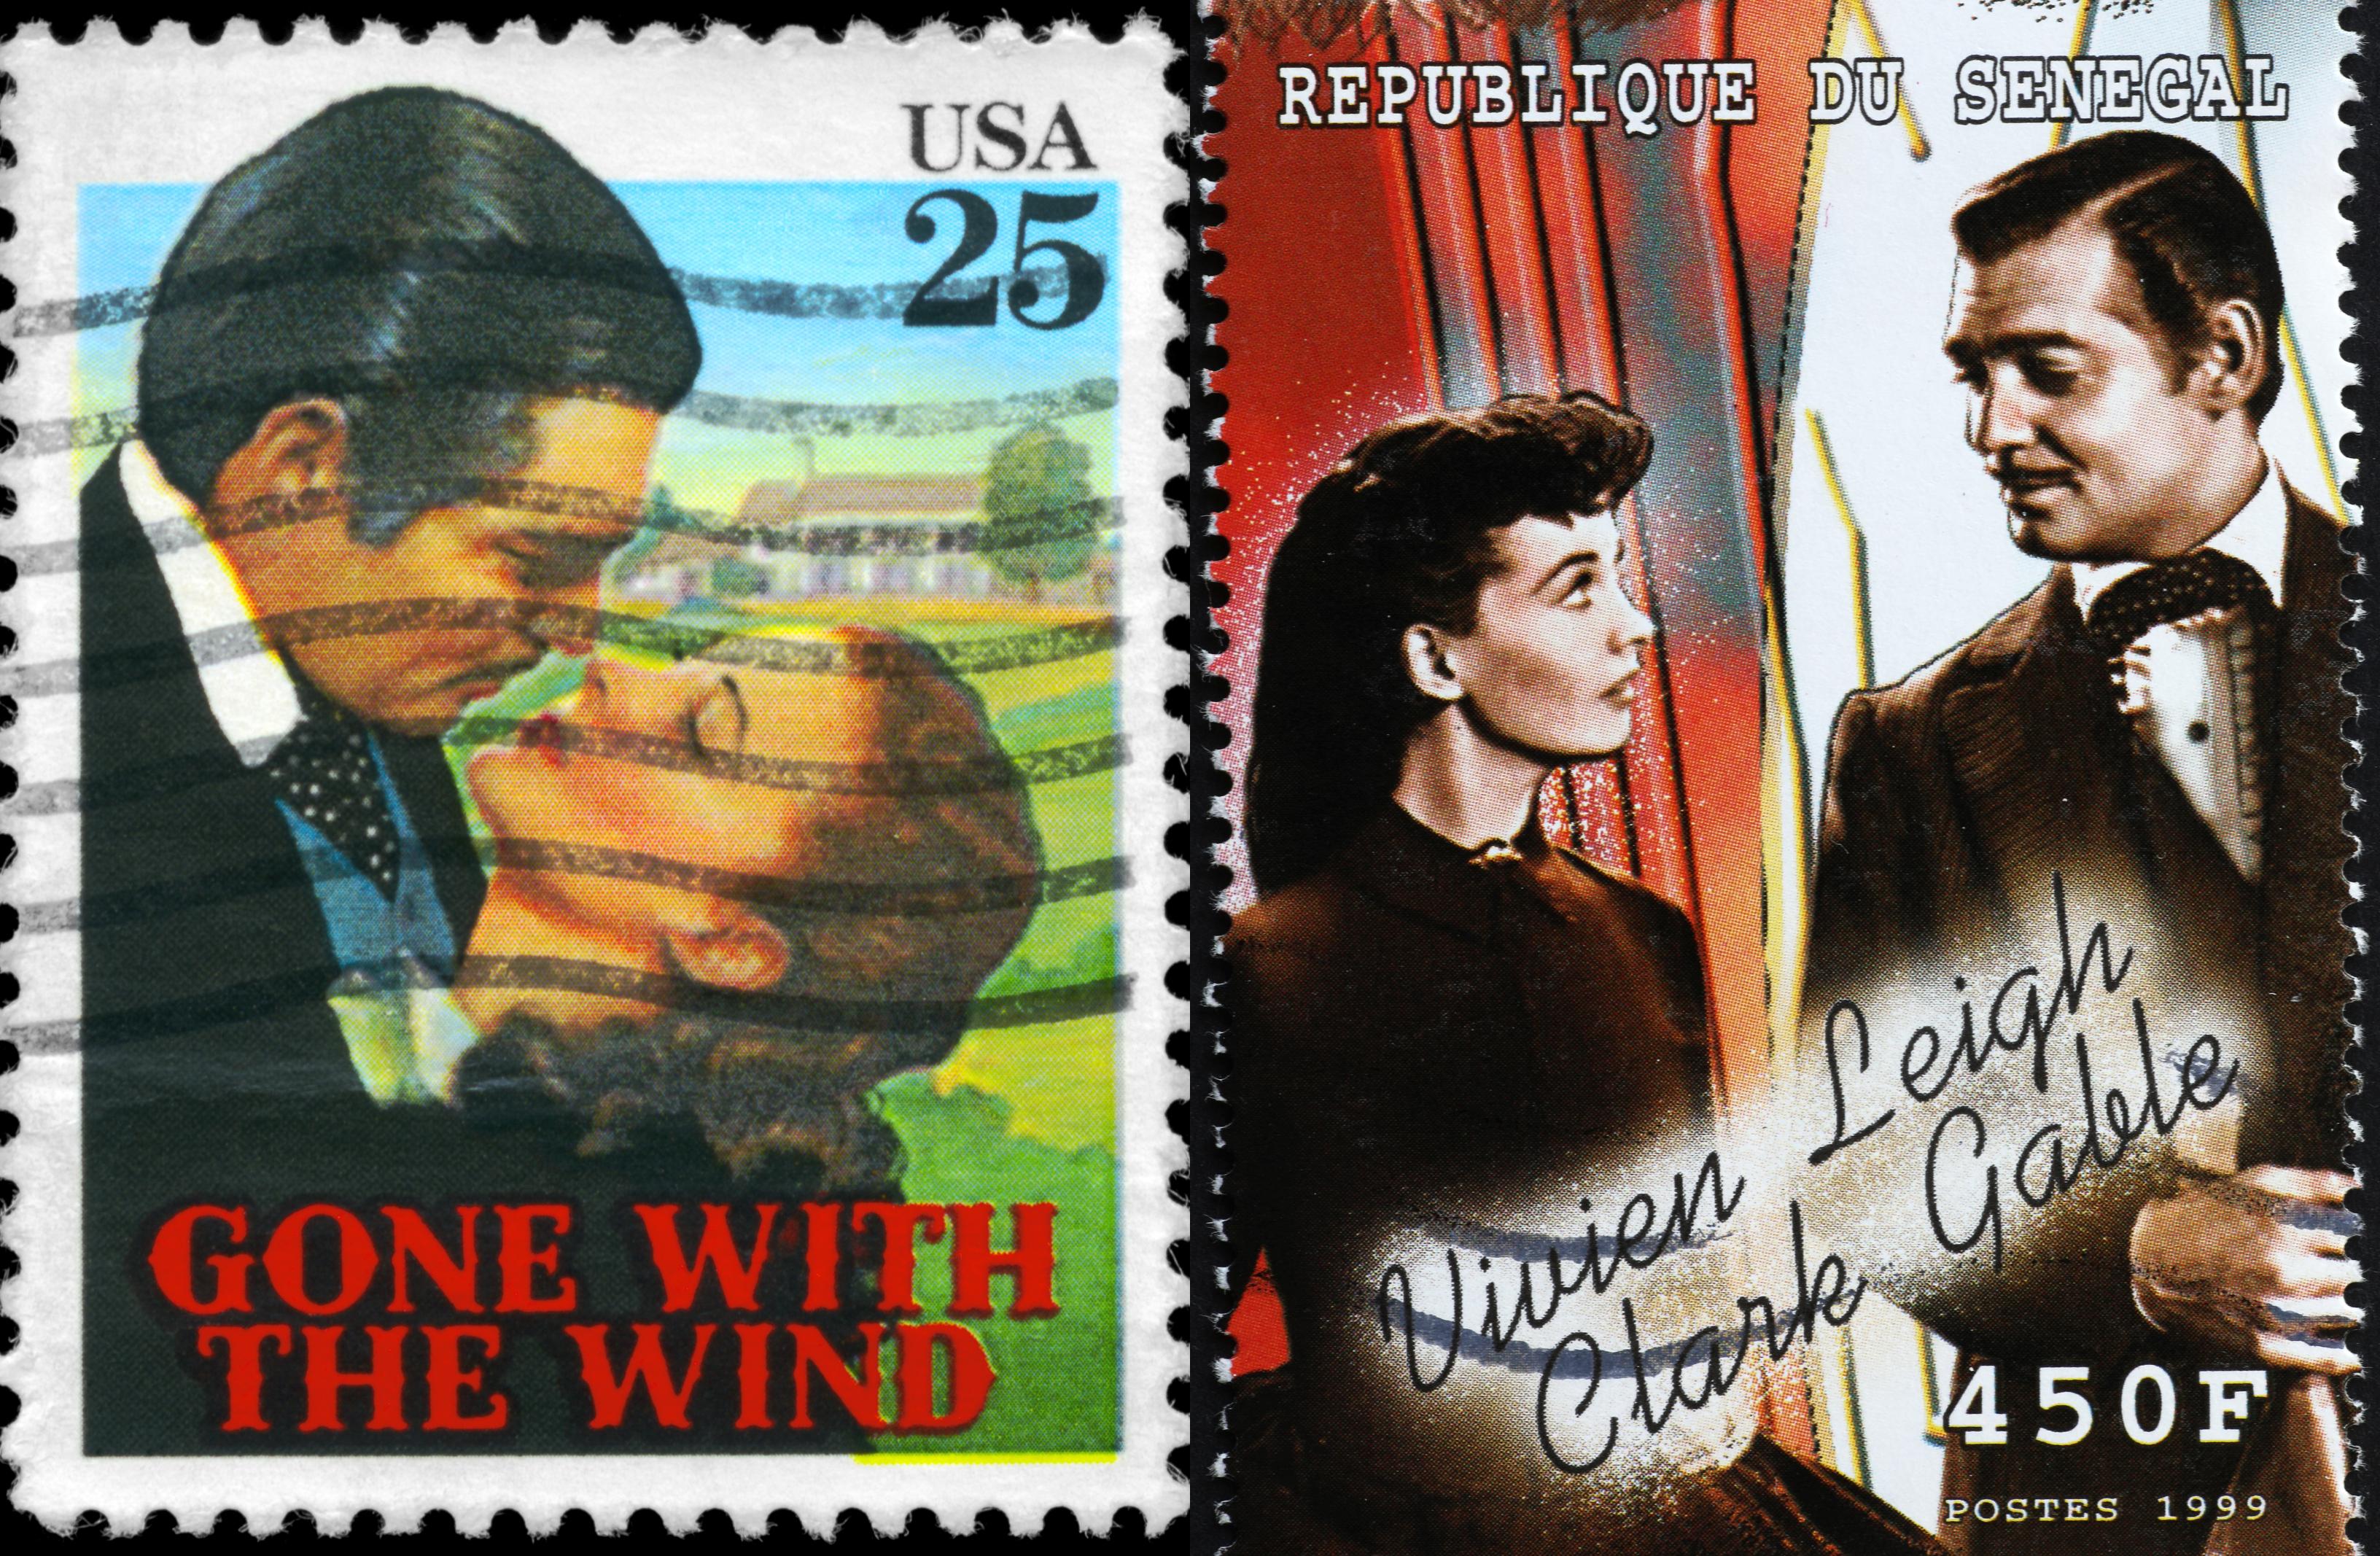 Vivien Leigh i Clark Gable na znaczkach pocztowych (fot. Shutterstock)